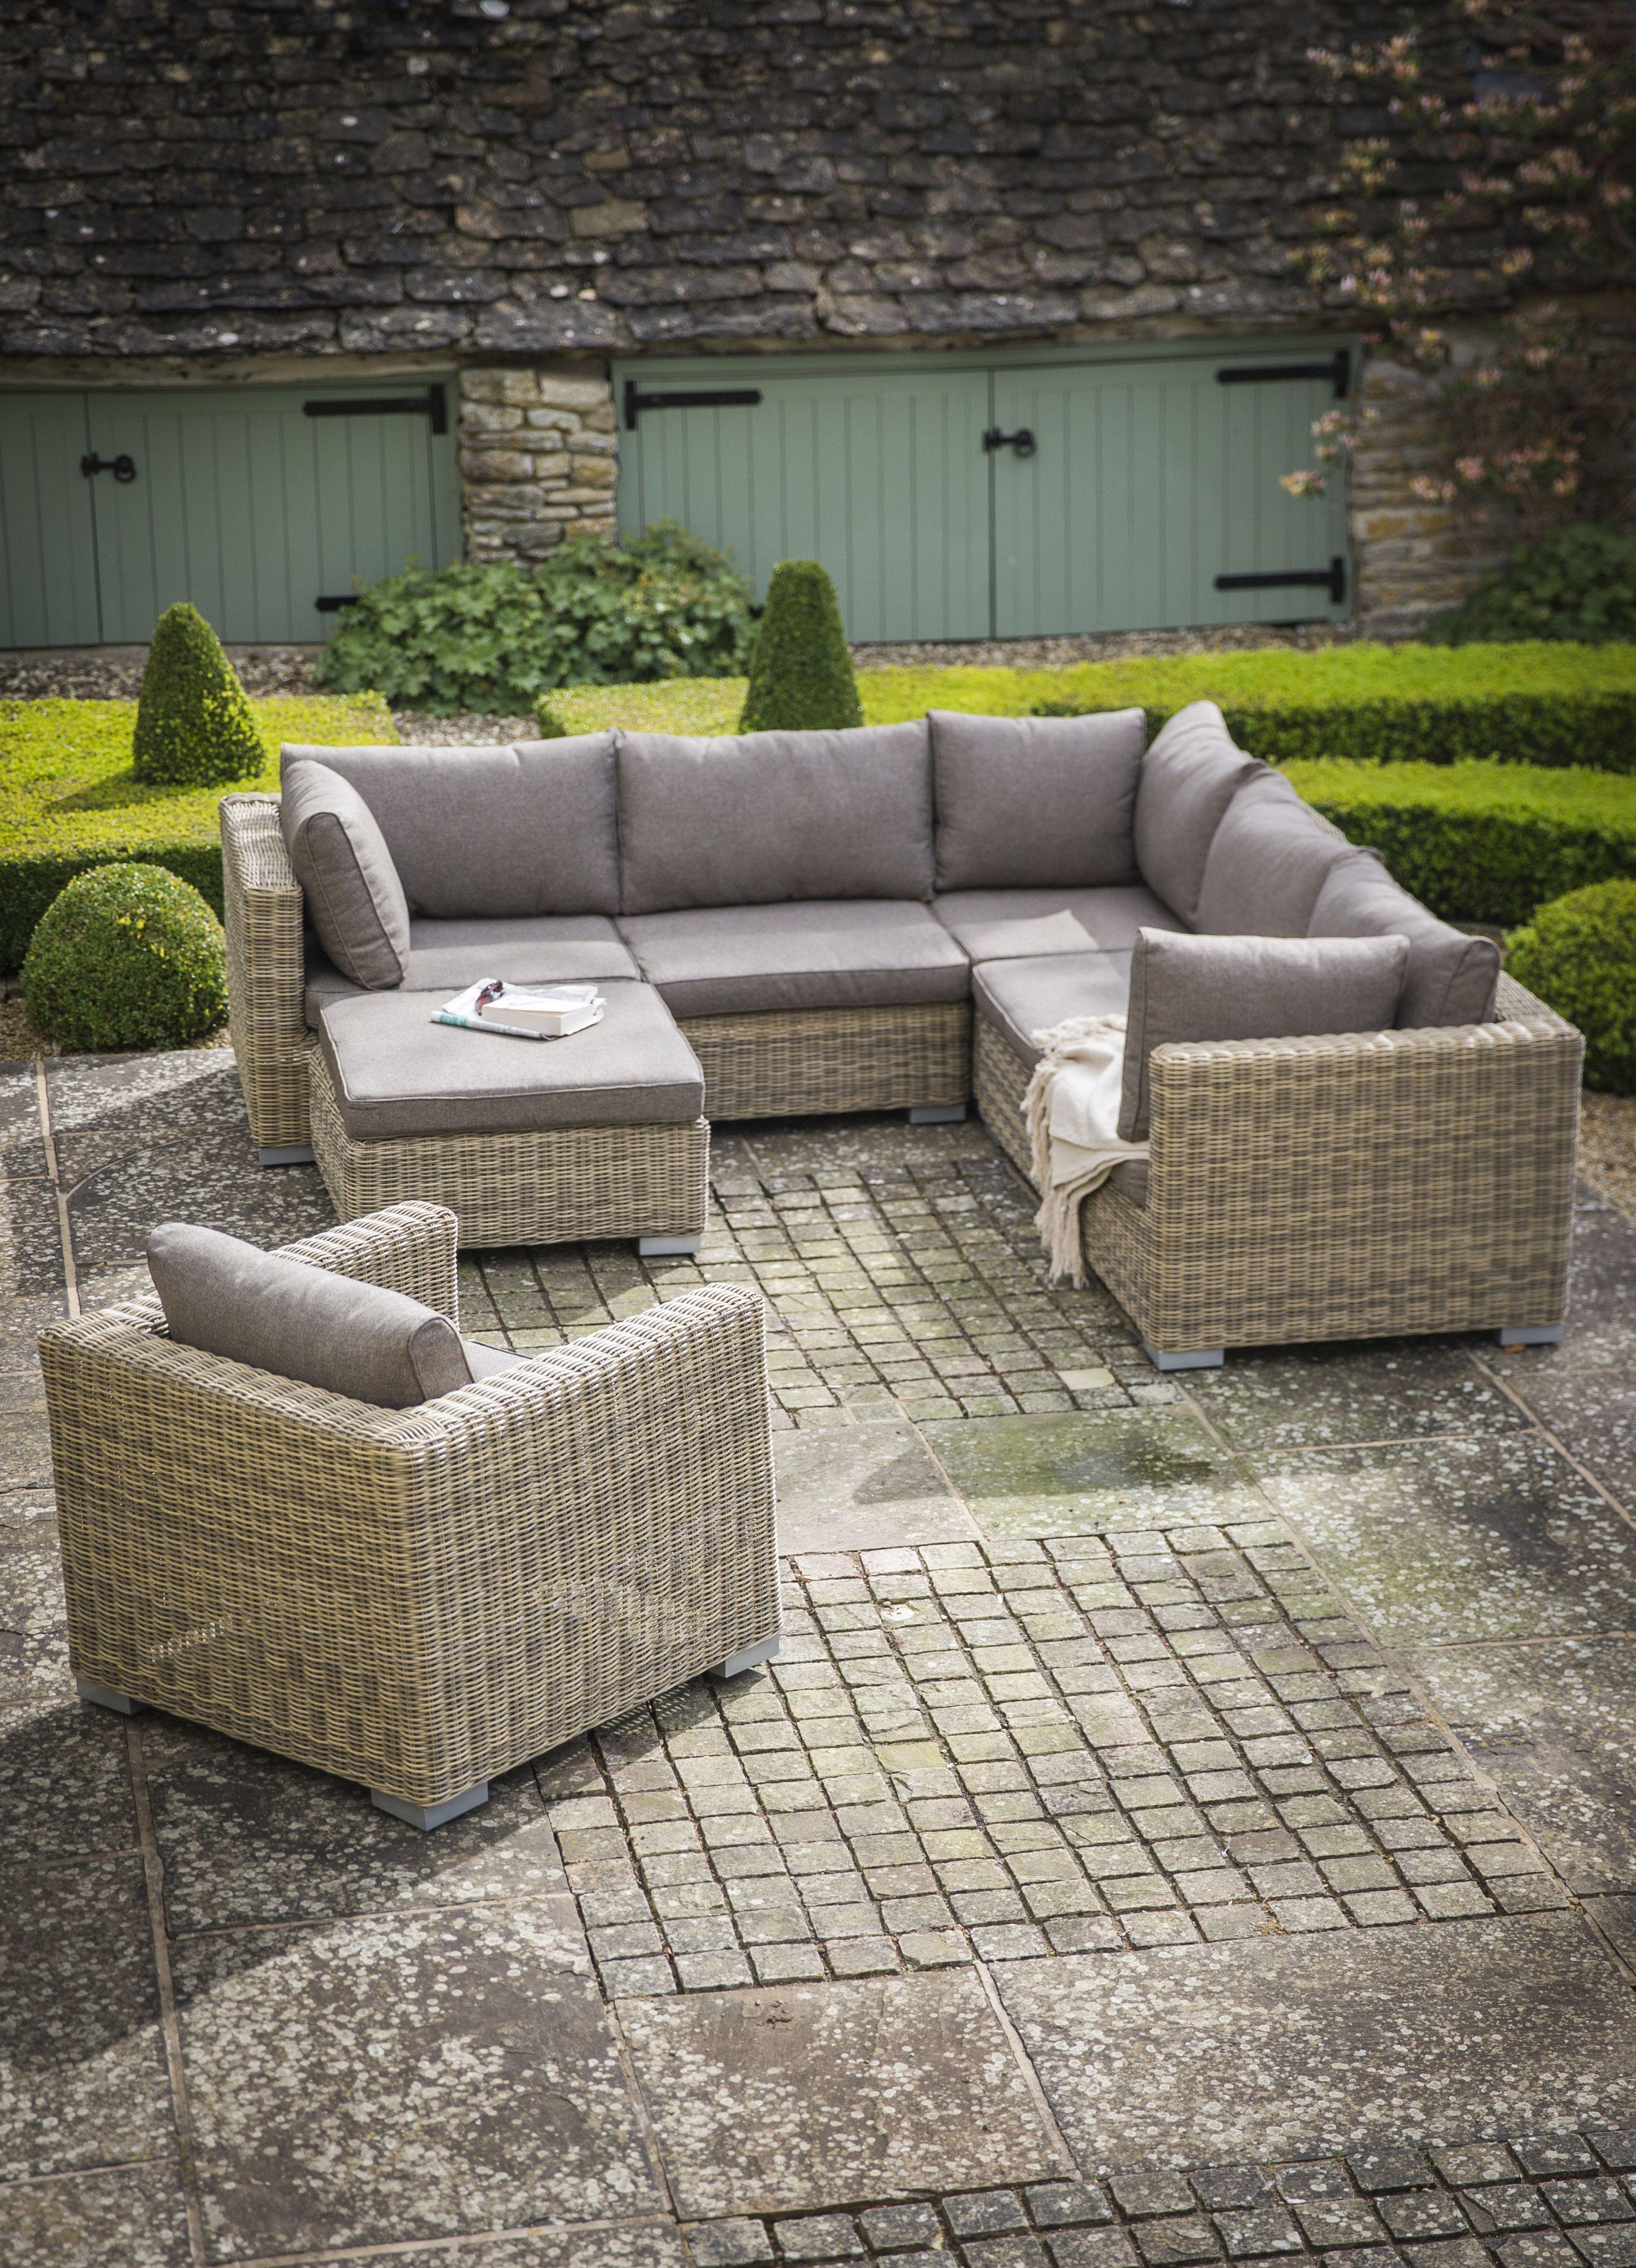 12 Stylish Garden Furniture Sets - Best Outdoor Furniture Sets